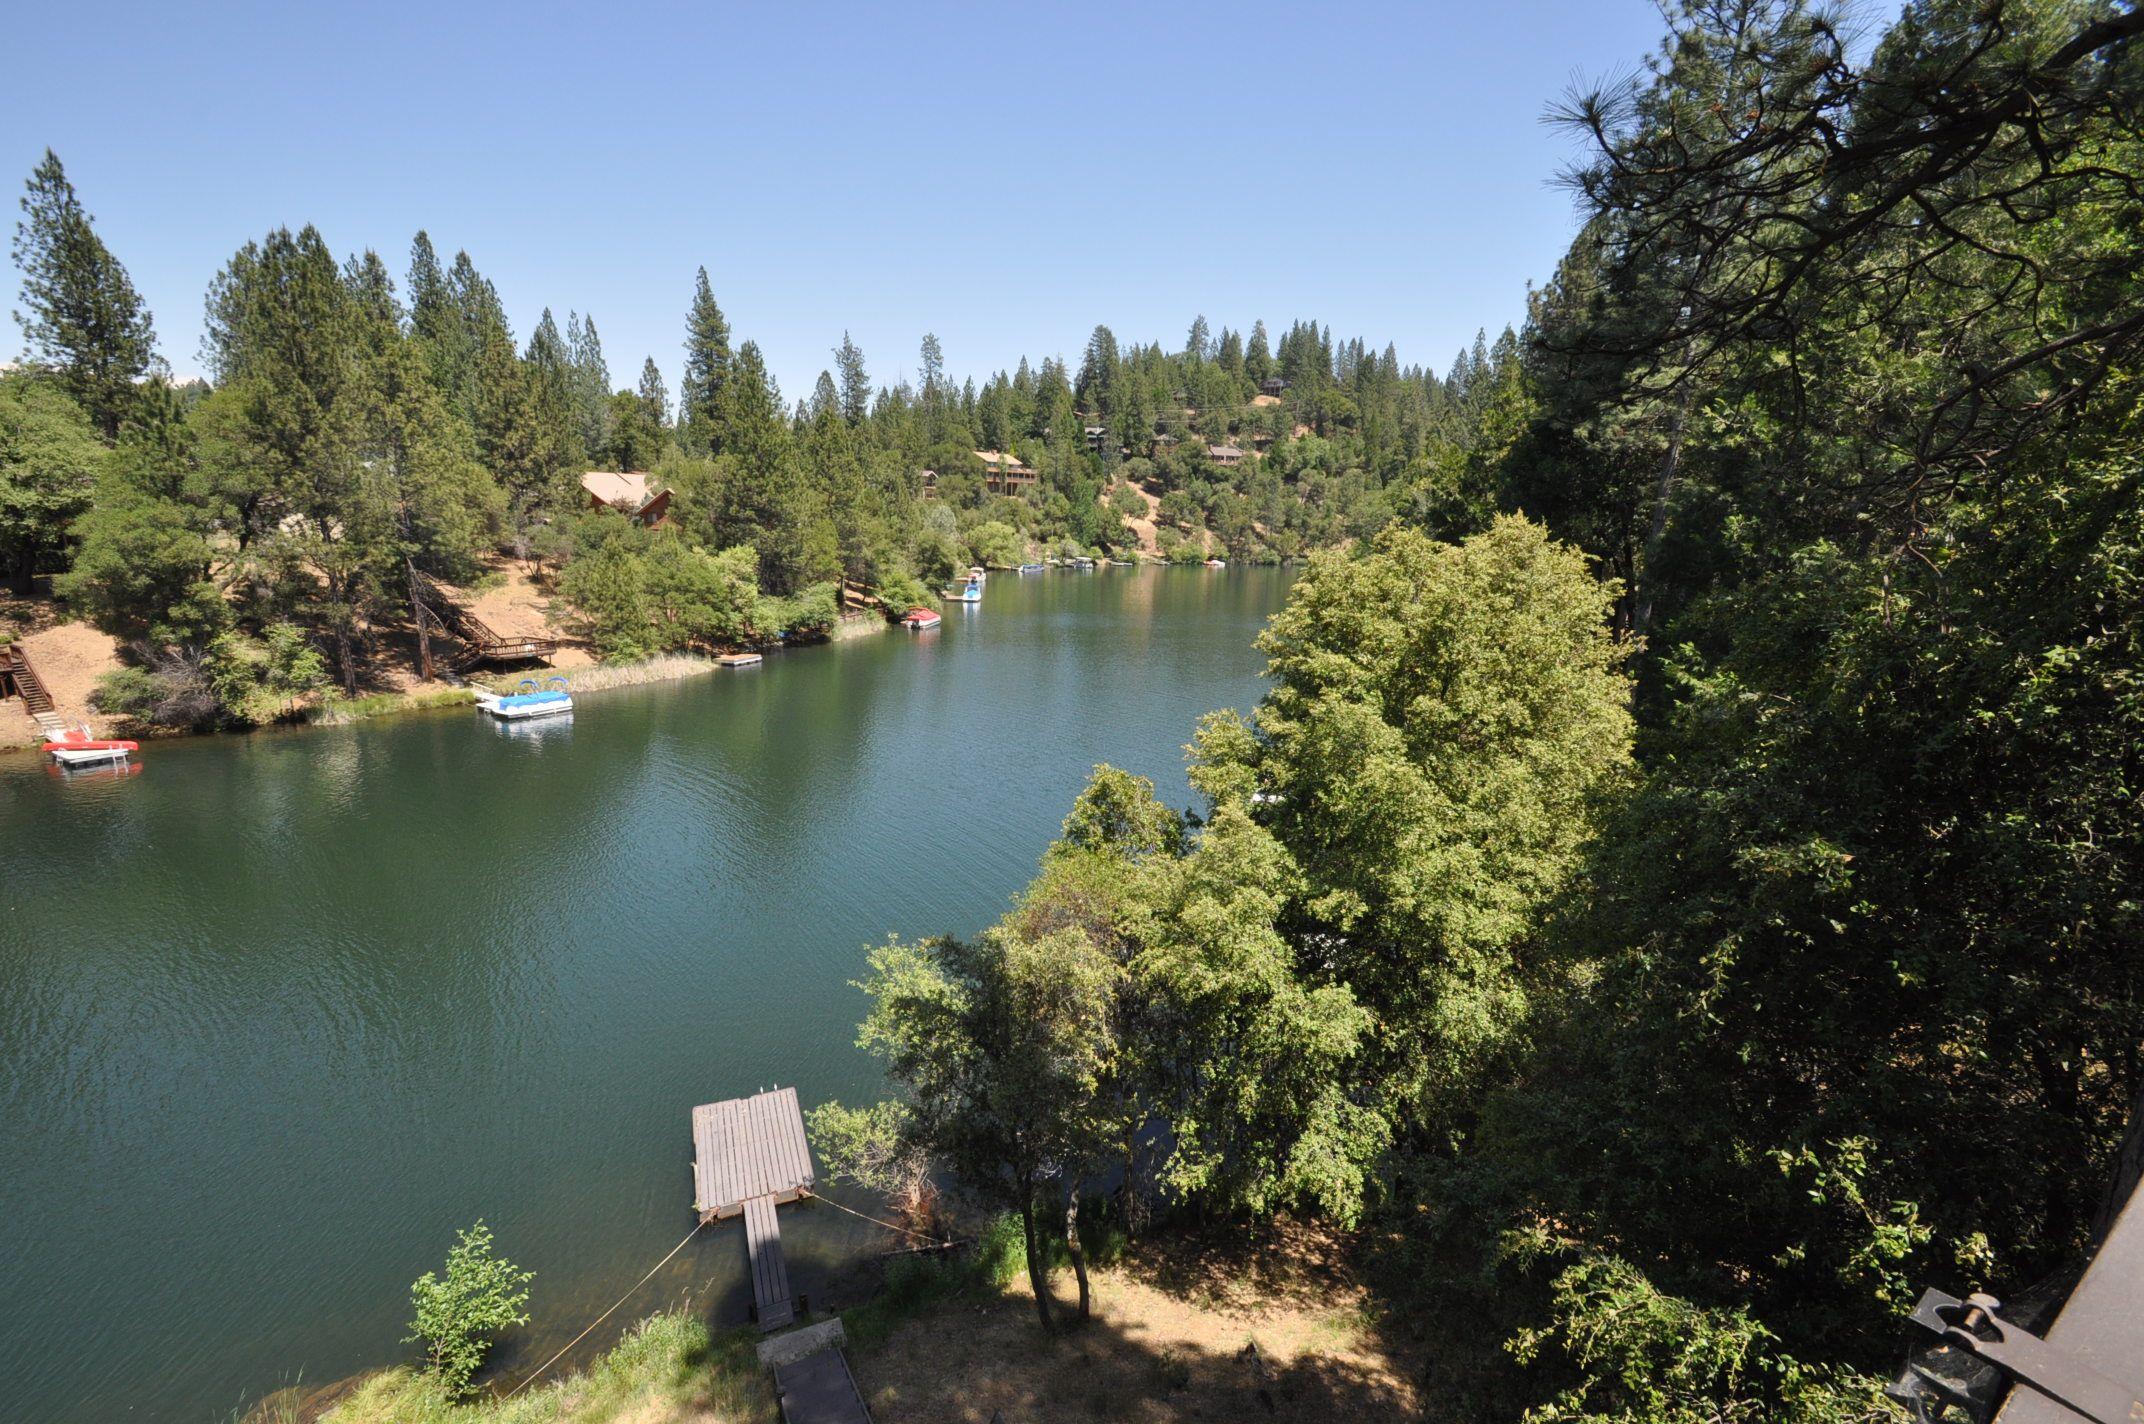 LAKEFRONT HOMES & CABINS FOR SALE. PINE MOUNTAIN LAKE REAL ESTATE SALES: Rob Stone Yosemite Region Resorts REALTOR® - ePRO - CHMS BRE# 01025463 www.HomesOnTheHill.com. #Lakefront #LakefrontForSale  #LakefrontCabinForSale #LakeviewCabinForSale #WaterfrontCabinForSale #RiverfrontCabinForSale #CabinForSale #California #LakeHouse #PineMountainLake #Groveland #Realtor #RobStone